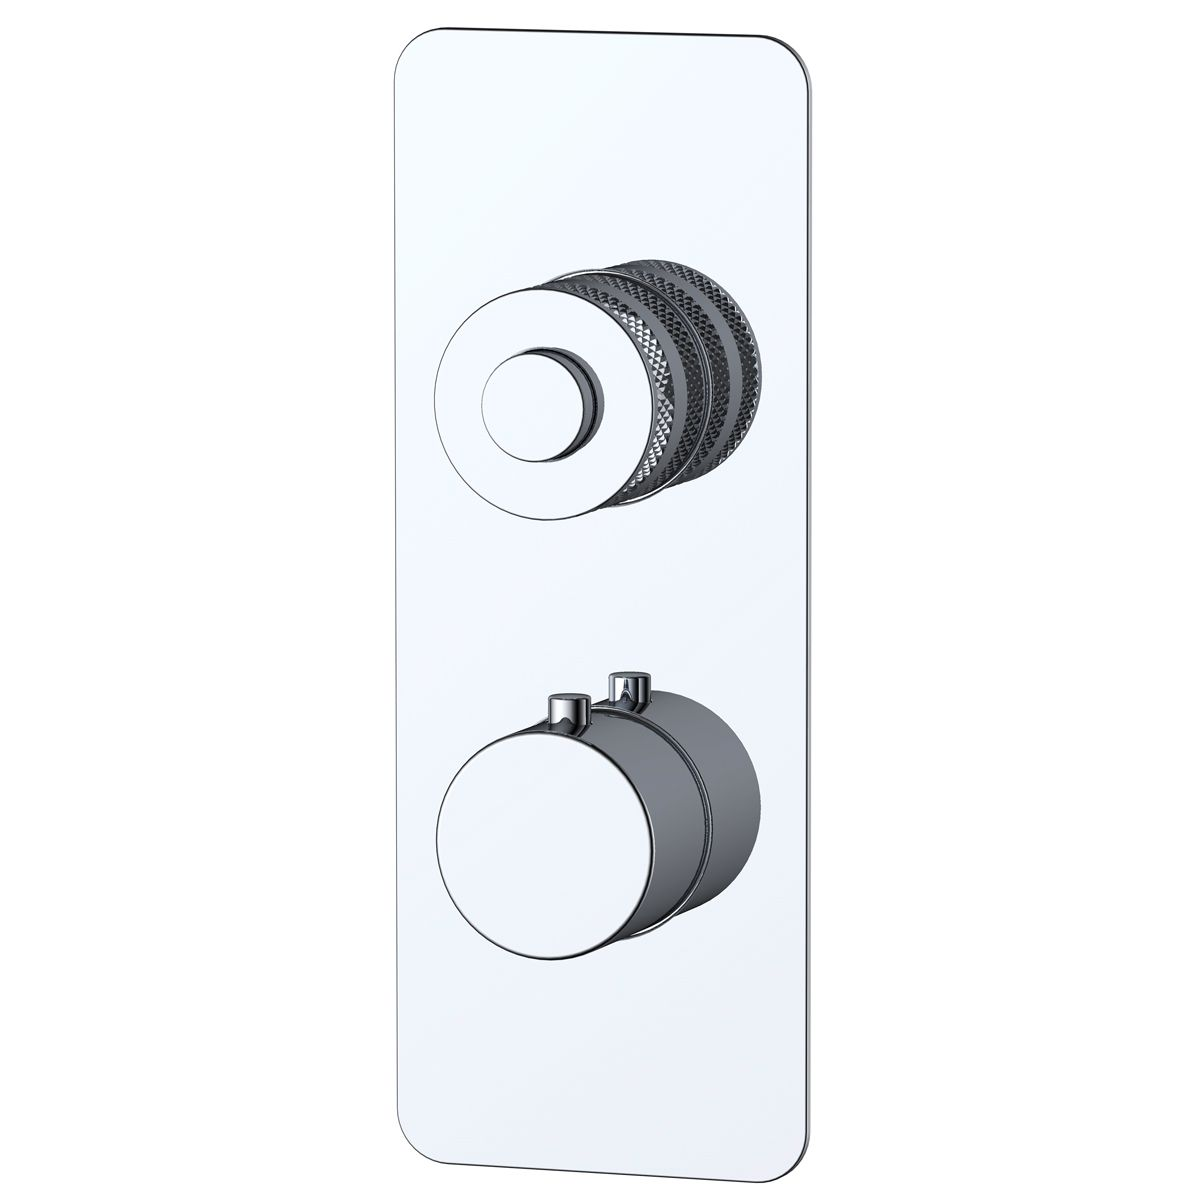 RAK Prima Tech Single Outlet Thermostatic Shower Valve